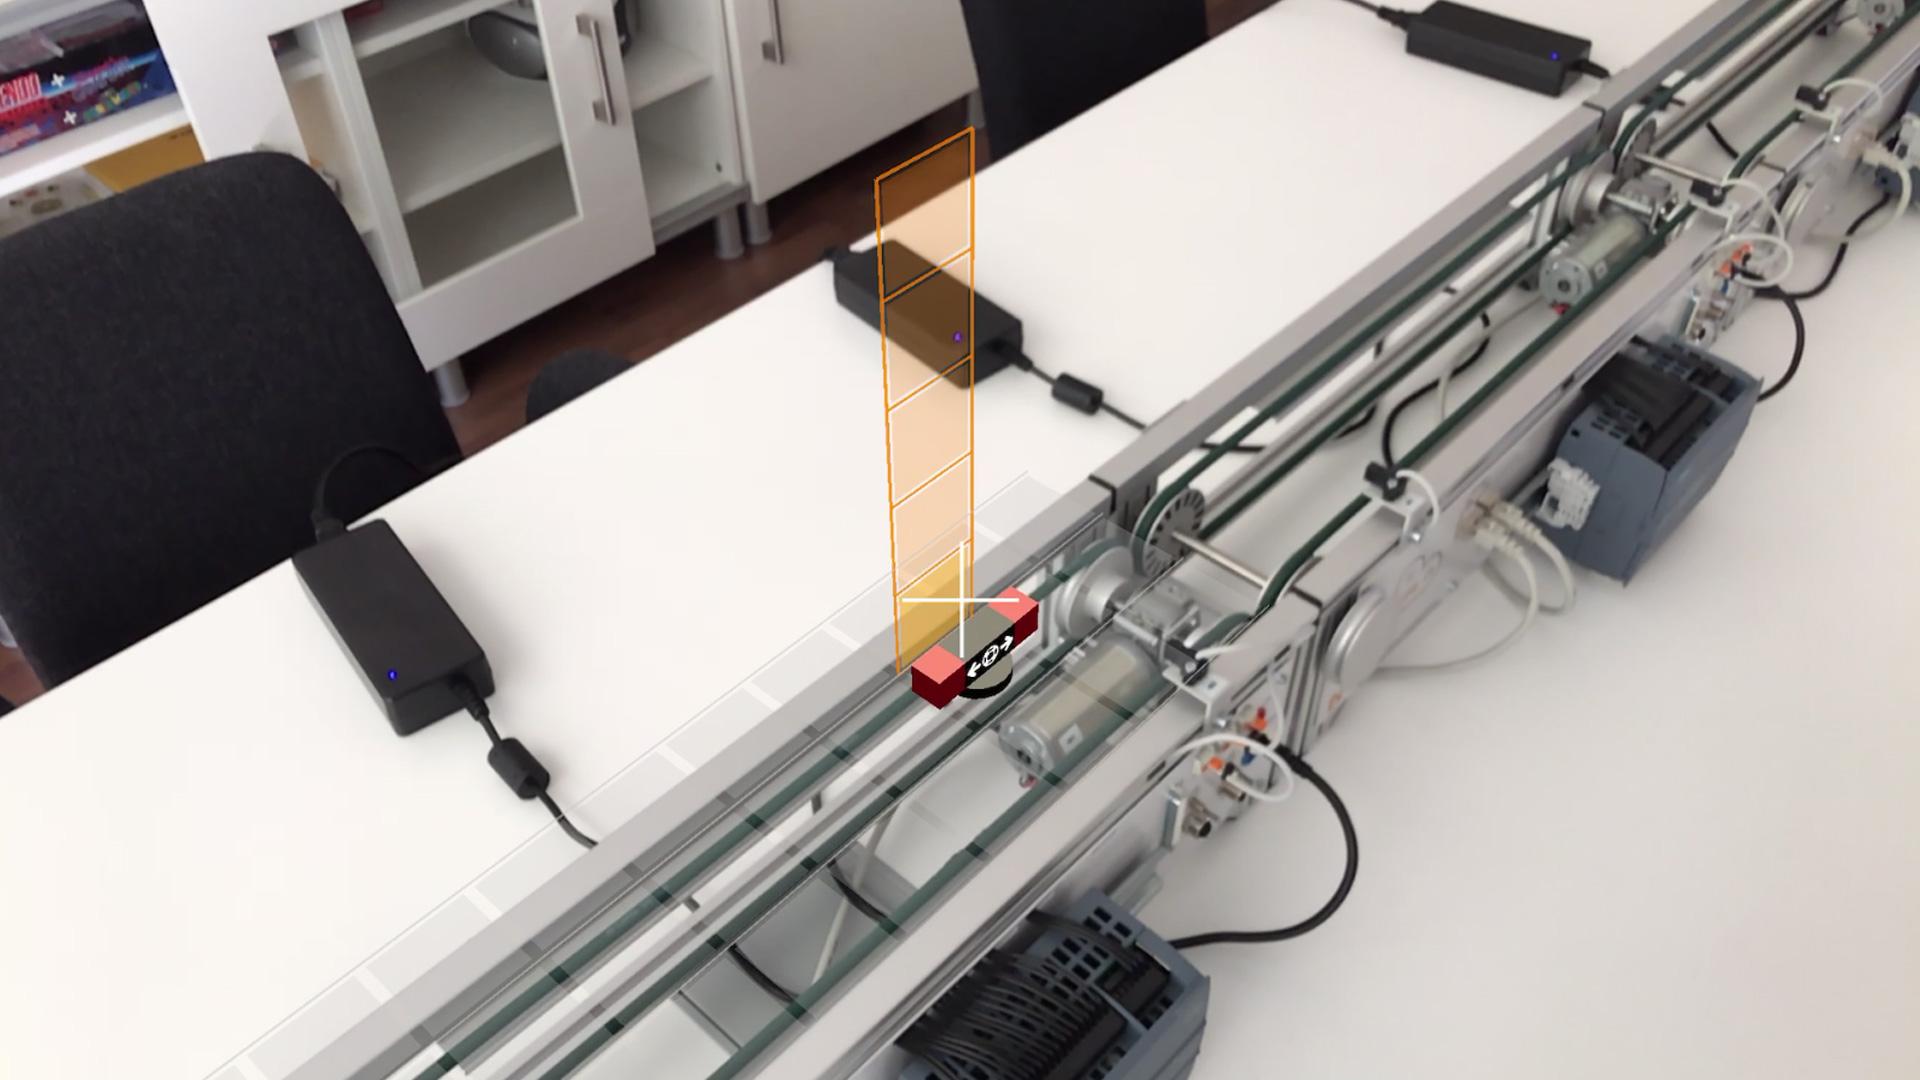 ims-factory-app-triboot-technologies-04